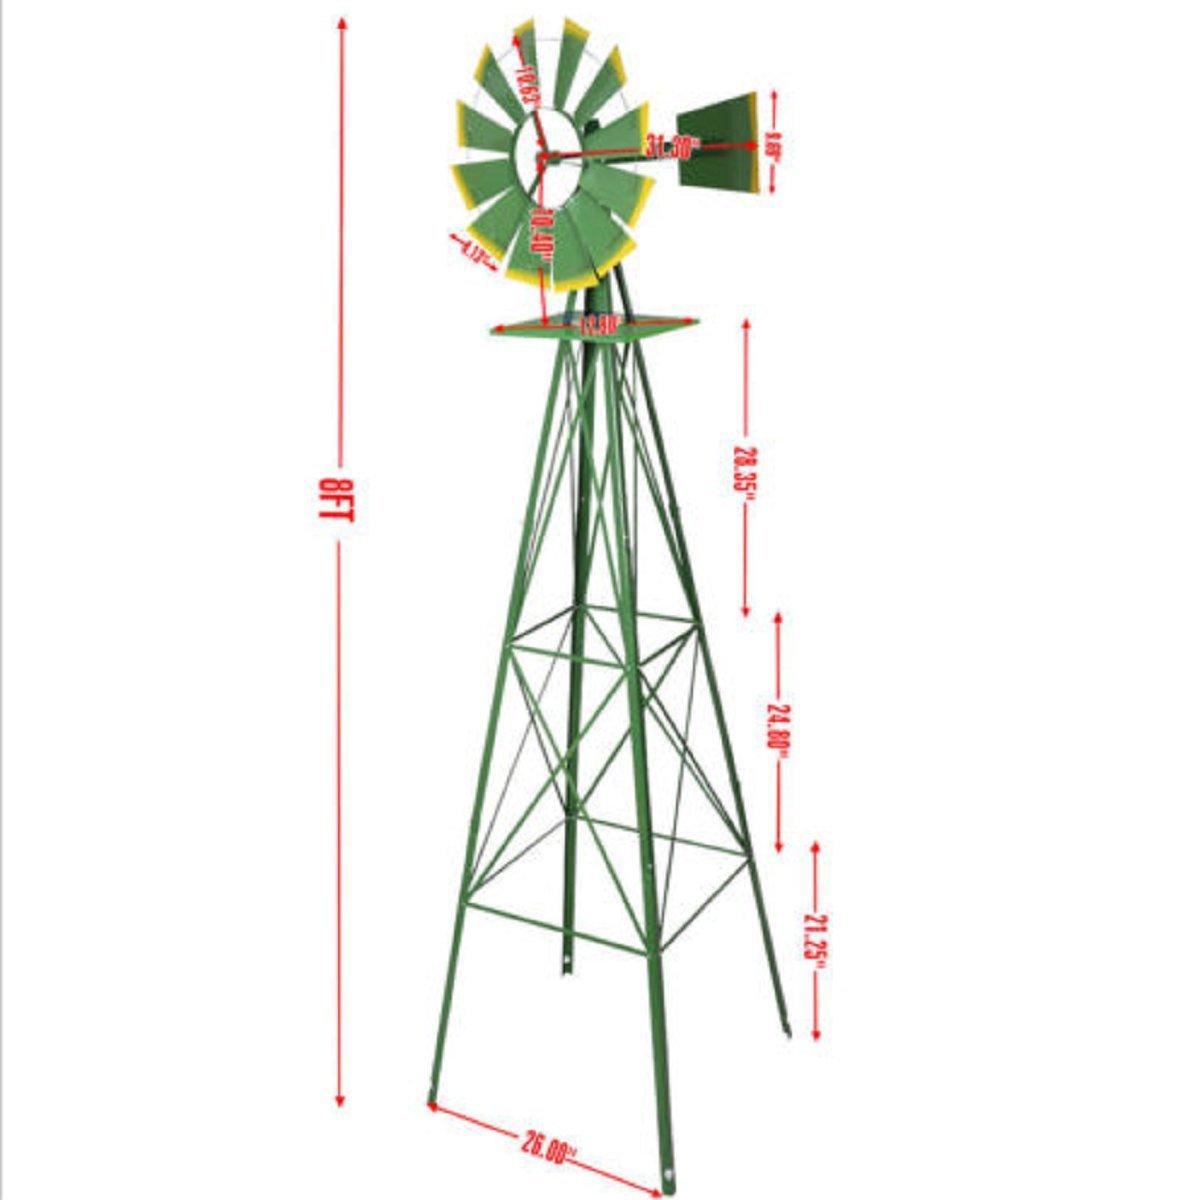 USAプレミアムStore風車Ornamental風ホイールグリーンとイエローガーデン天気ベーン8 ft Tall B075FLQDKX 22403